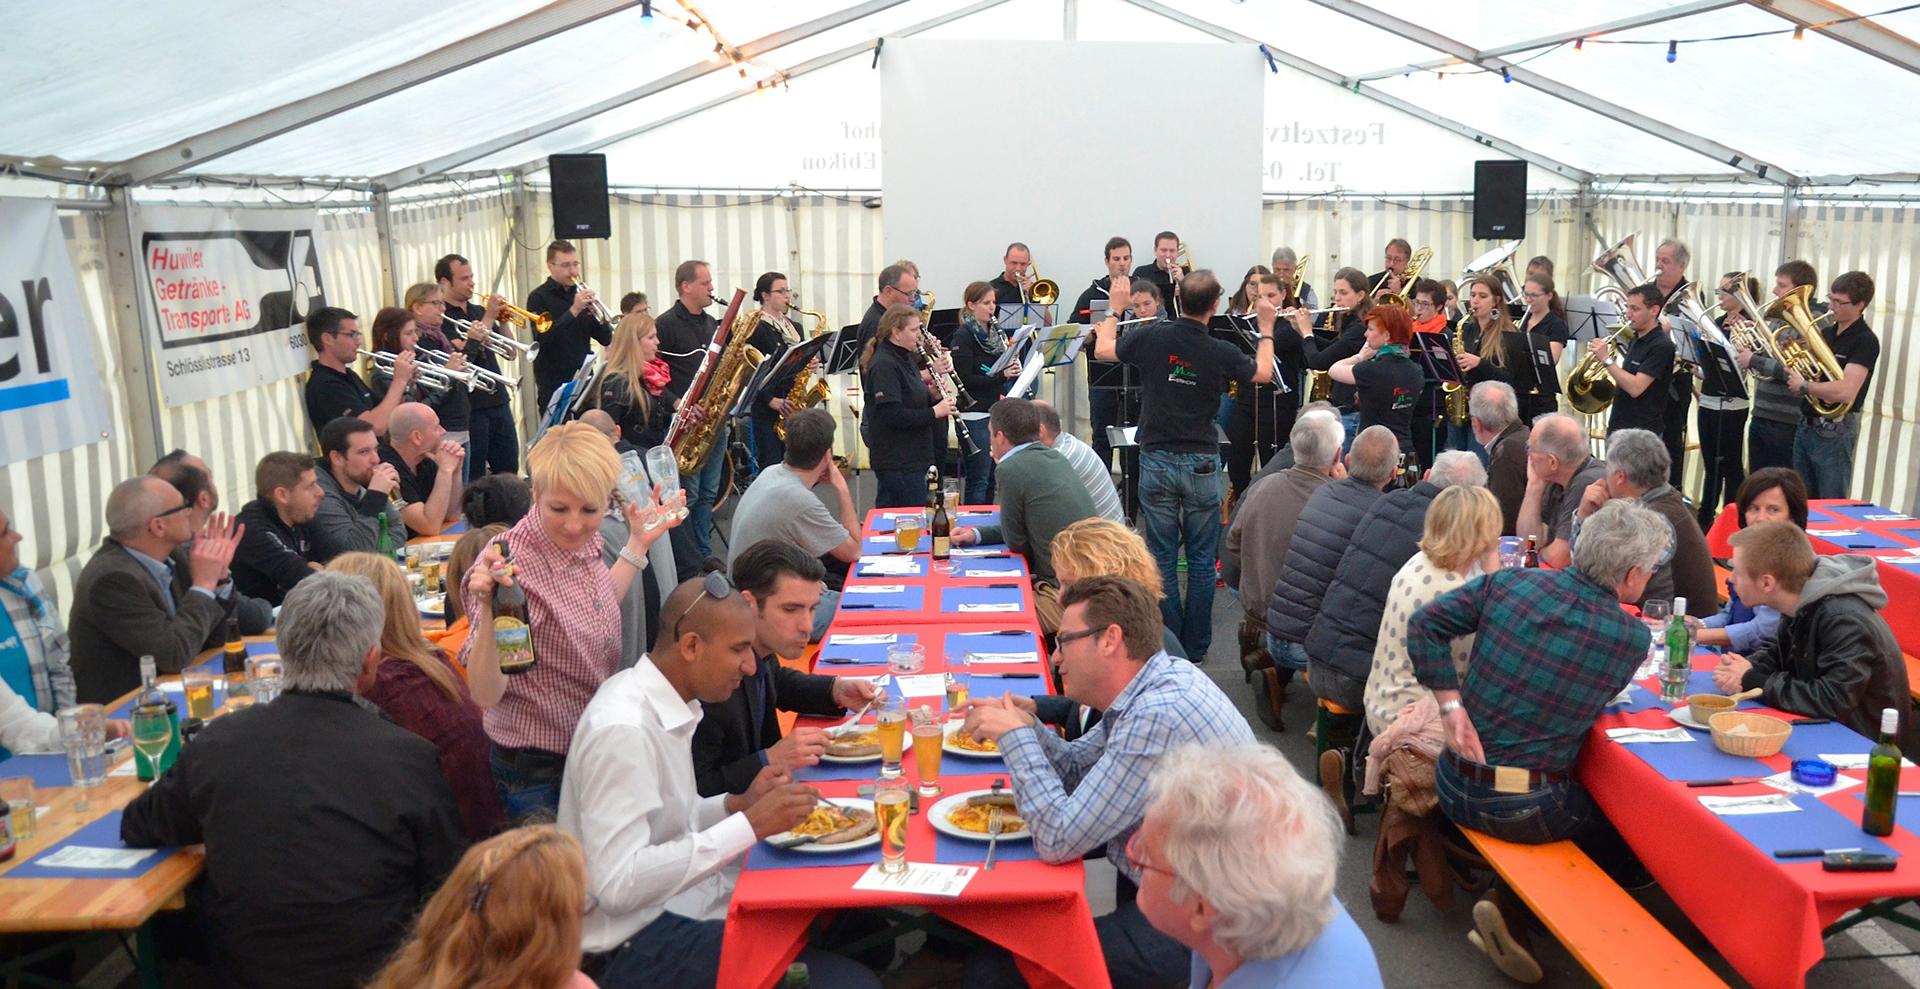 Festzelt_Restaurant-Bahnhöfli_Ebikon